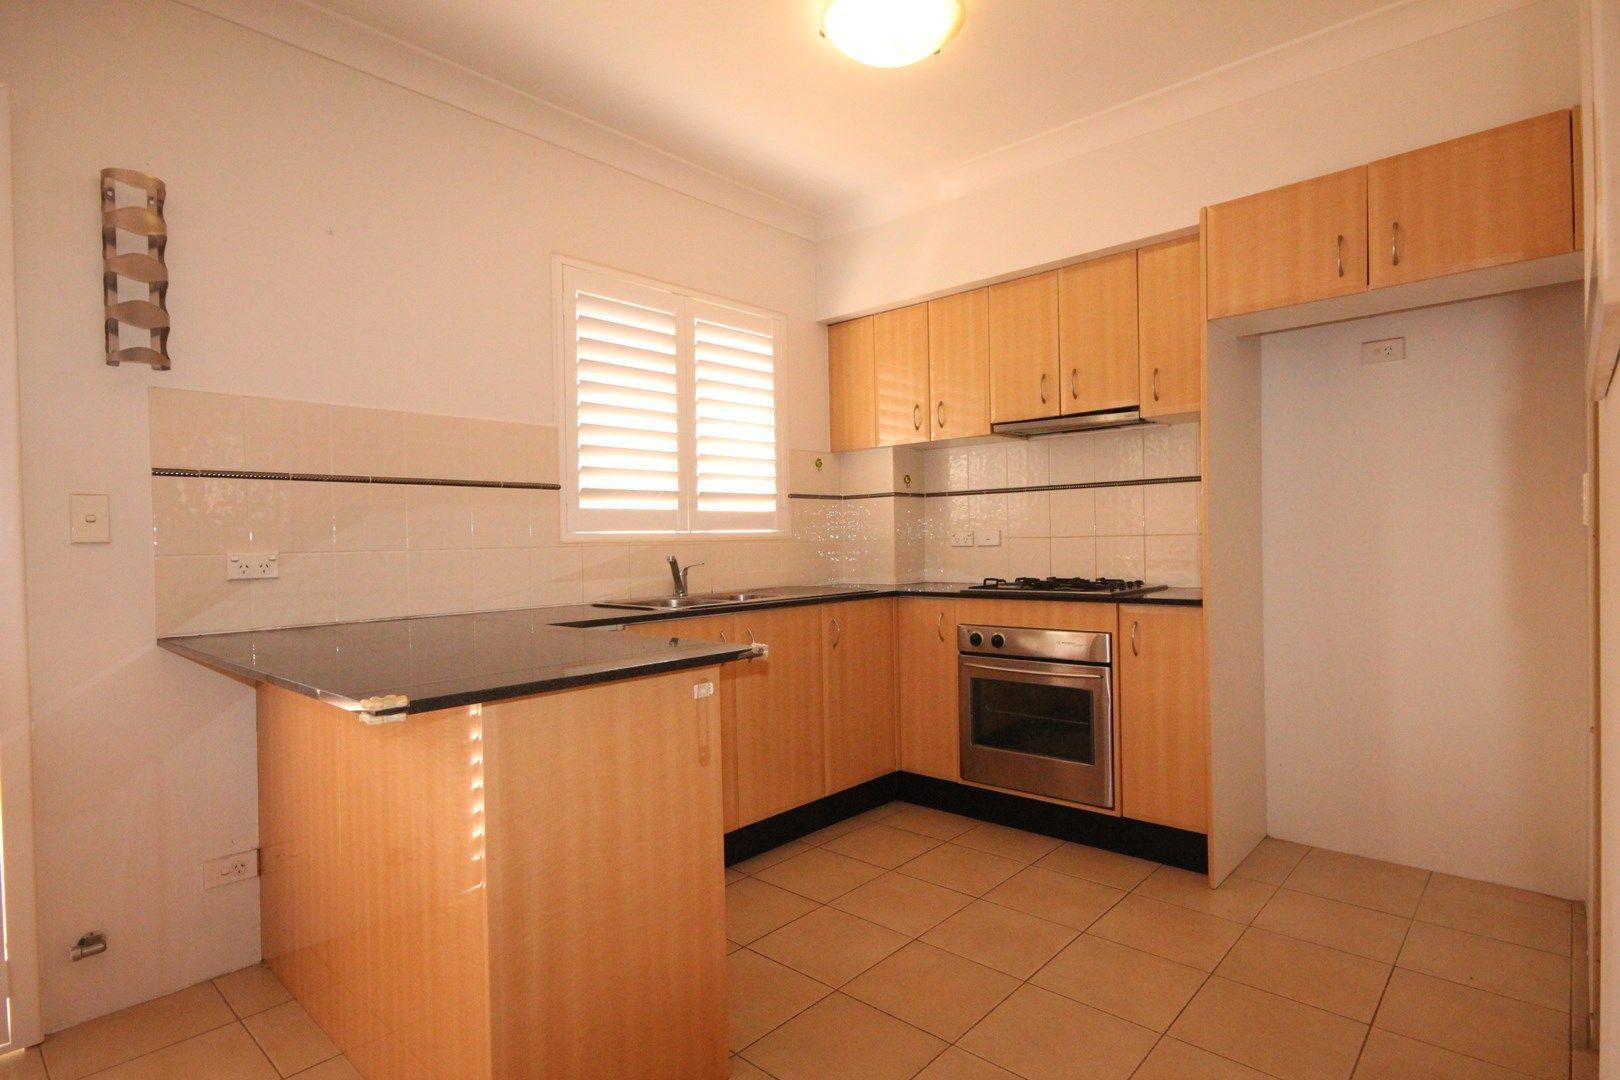 12/9 Anselm Street, Strathfield South NSW 2136, Image 0